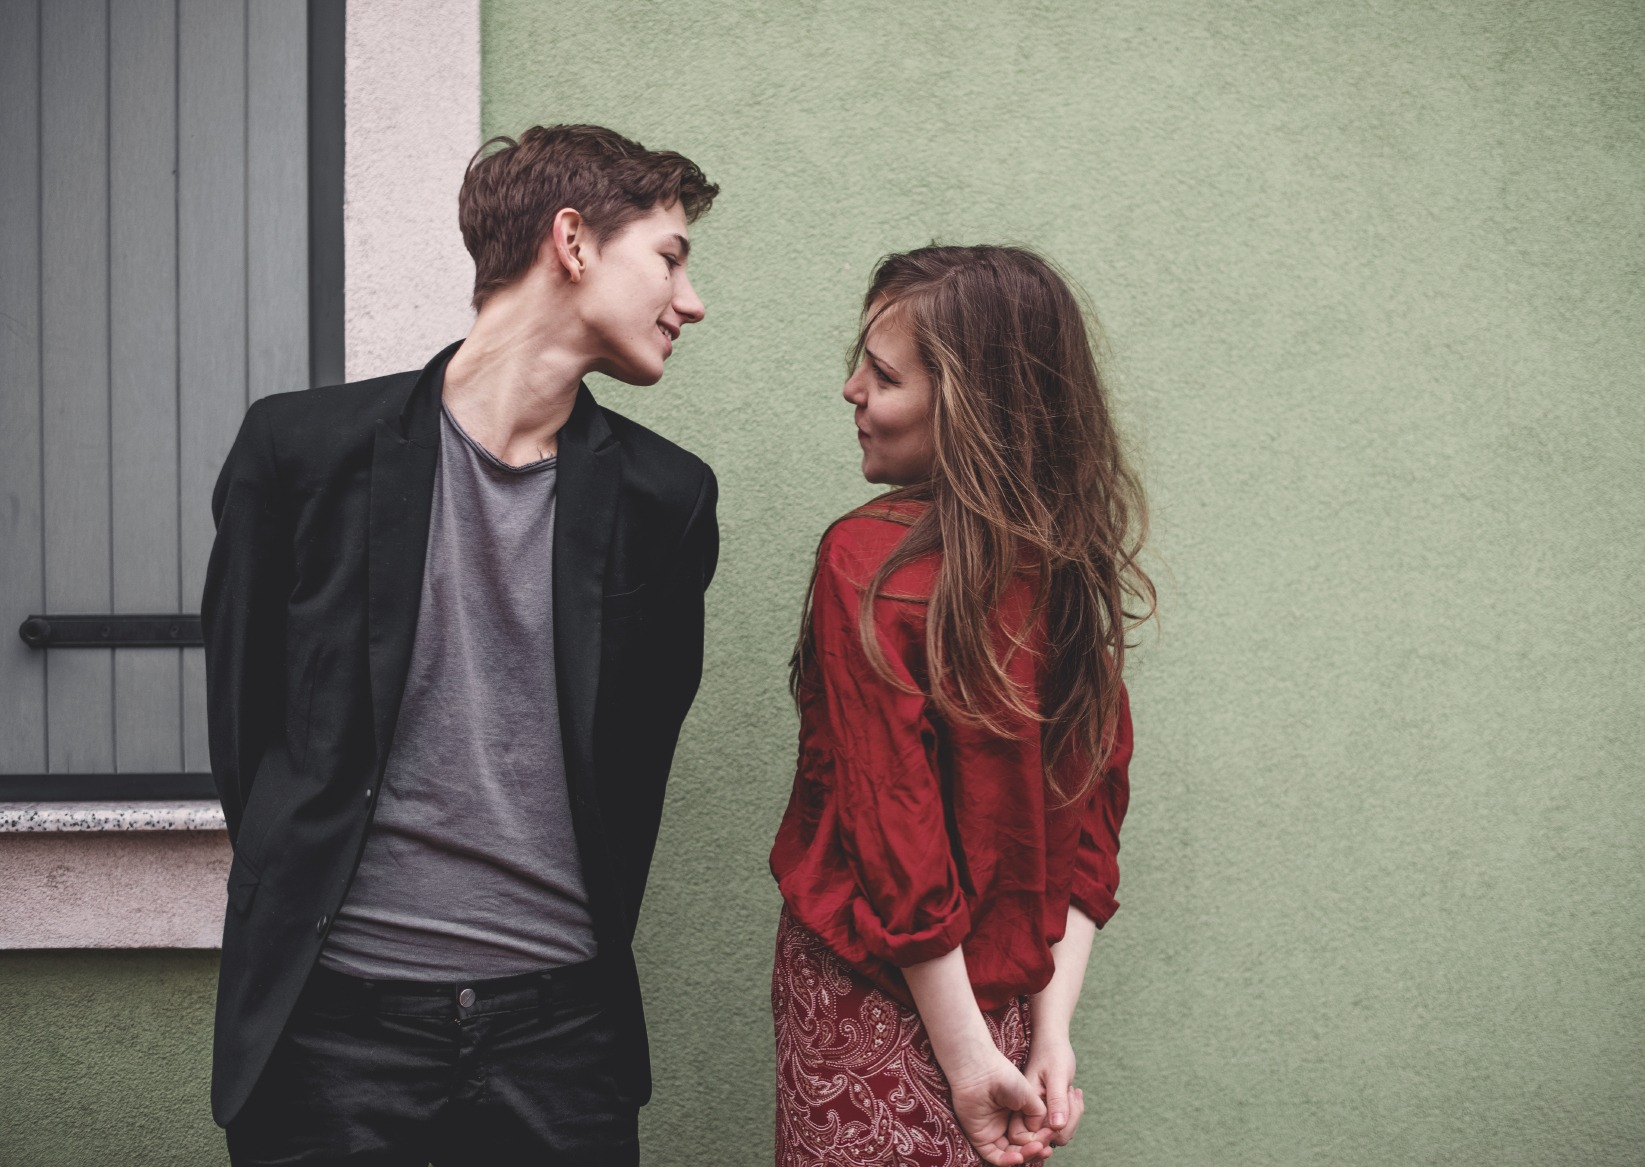 Sexo desprotegido na adolescência